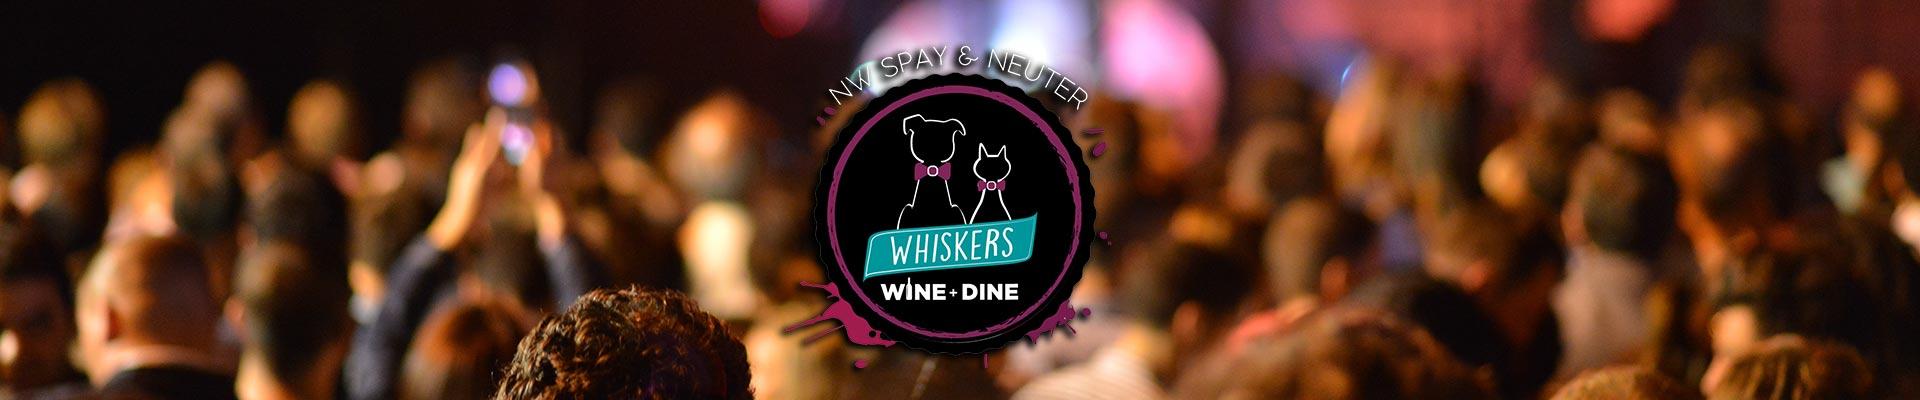 wwd-nswn-hero-rs-logo